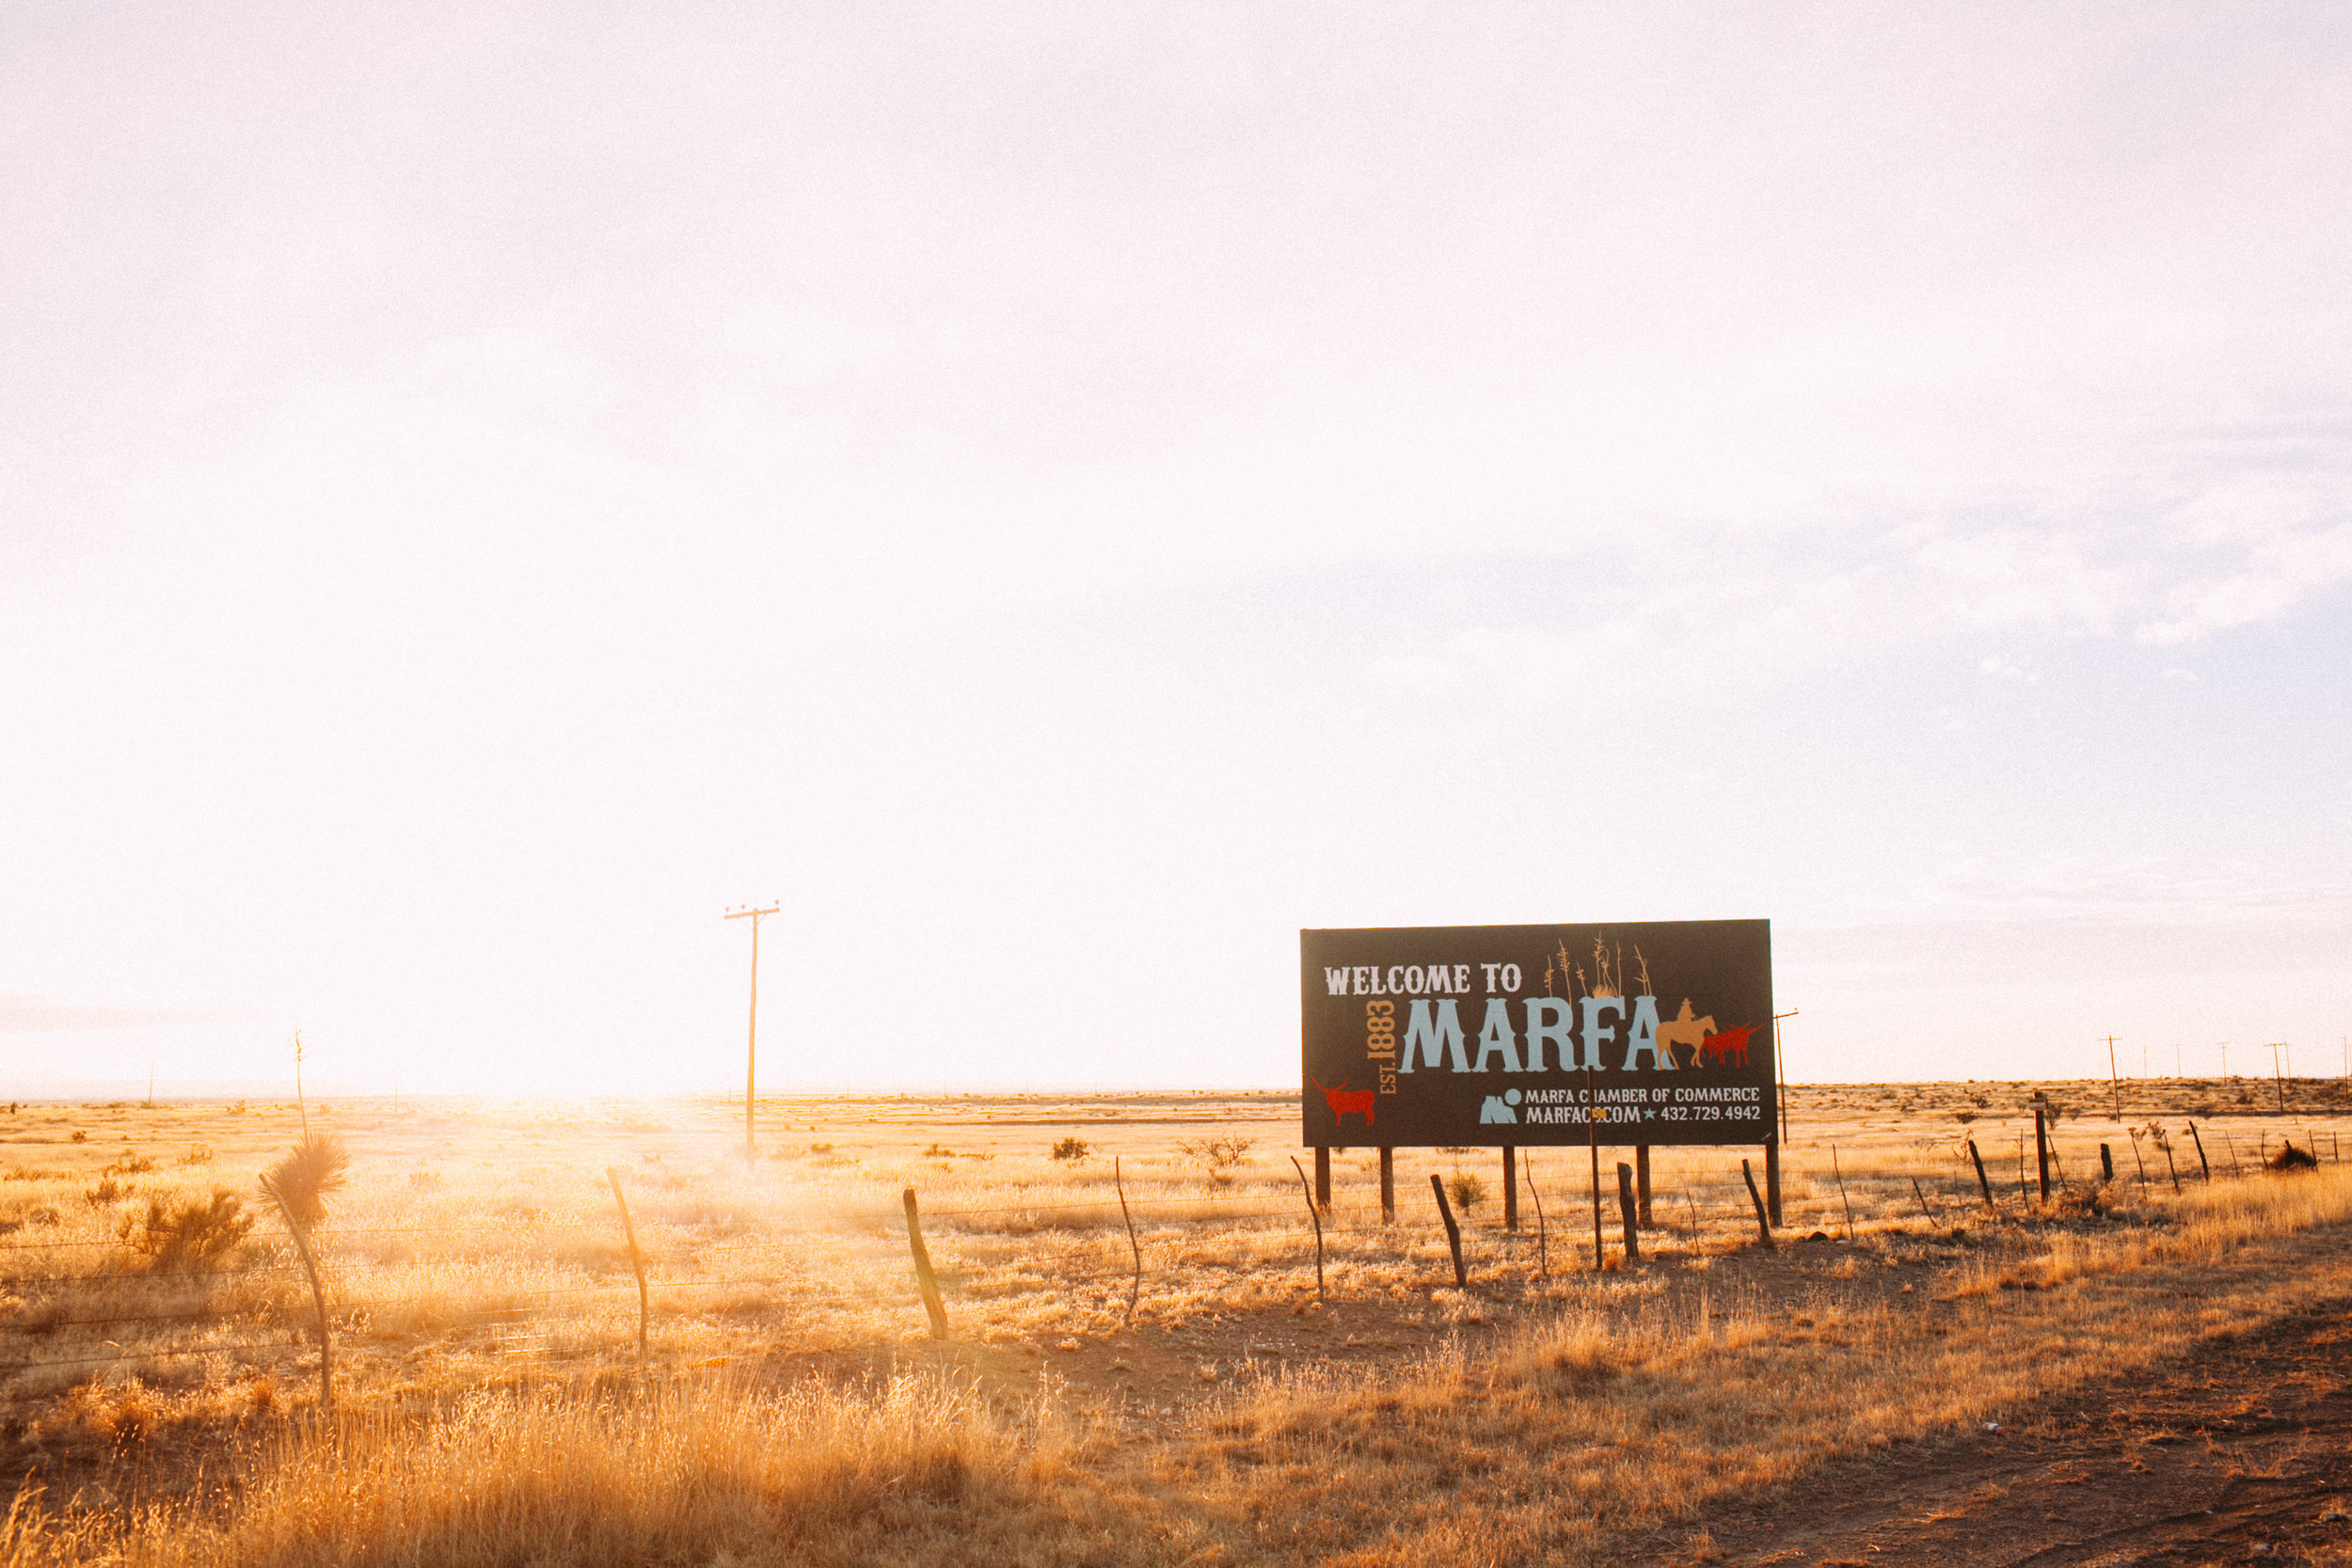 Marfa Texas Day 1 Chloe and Ashley 2015-2.jpg